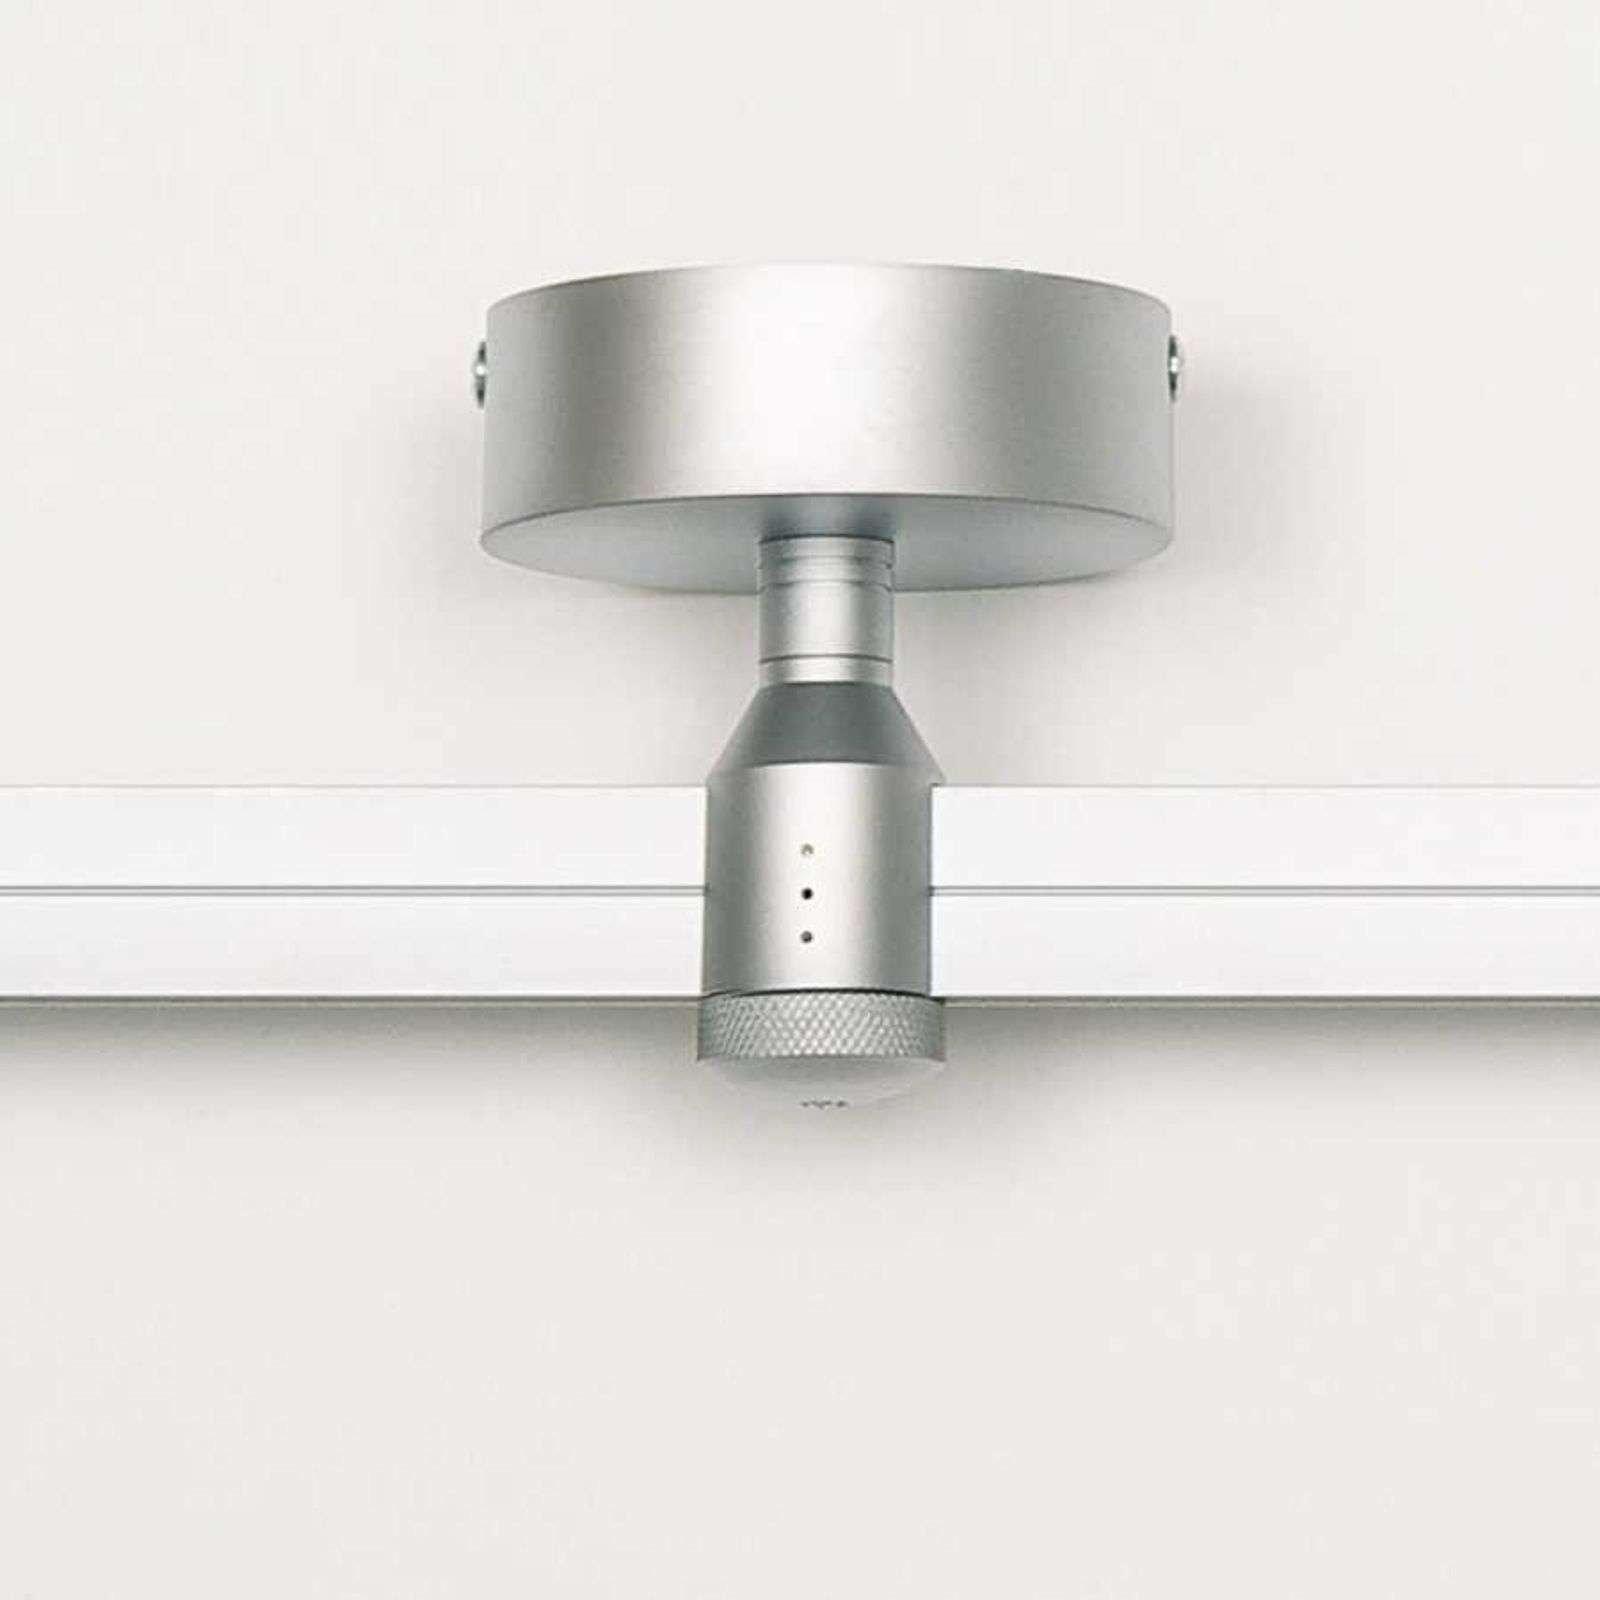 OLIGO Check In ceiling power connector 52 cm